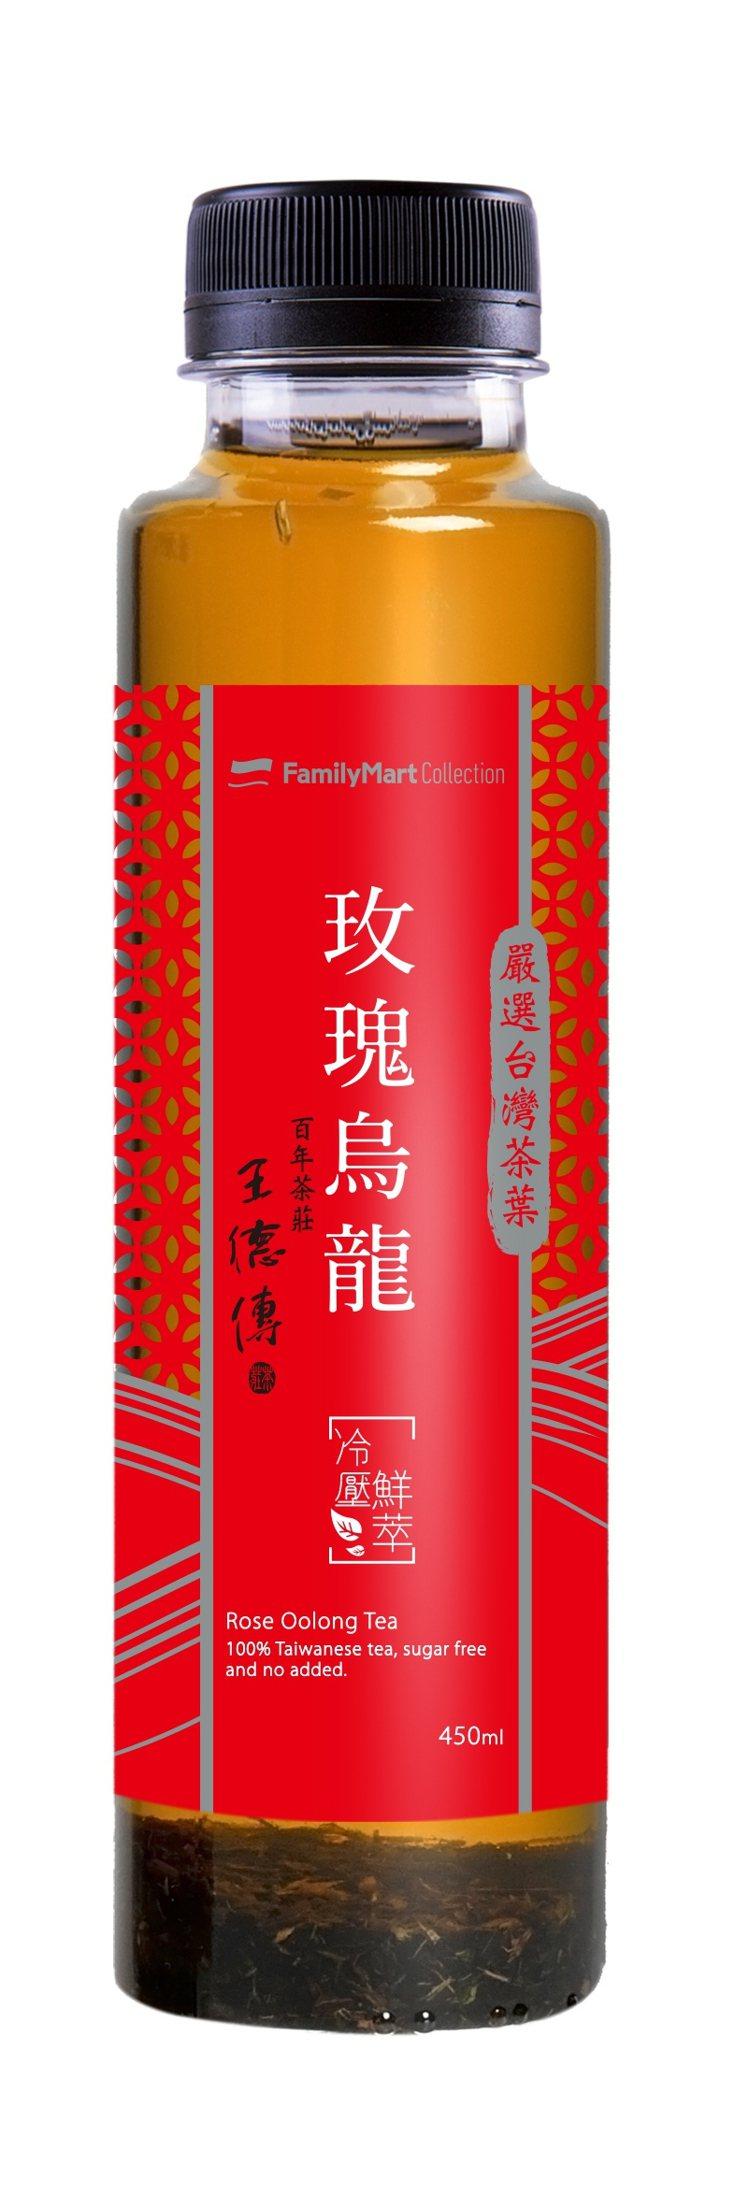 FamilyMart Collection冷壓鮮萃茶玫瑰烏龍,售價50元。圖/全...